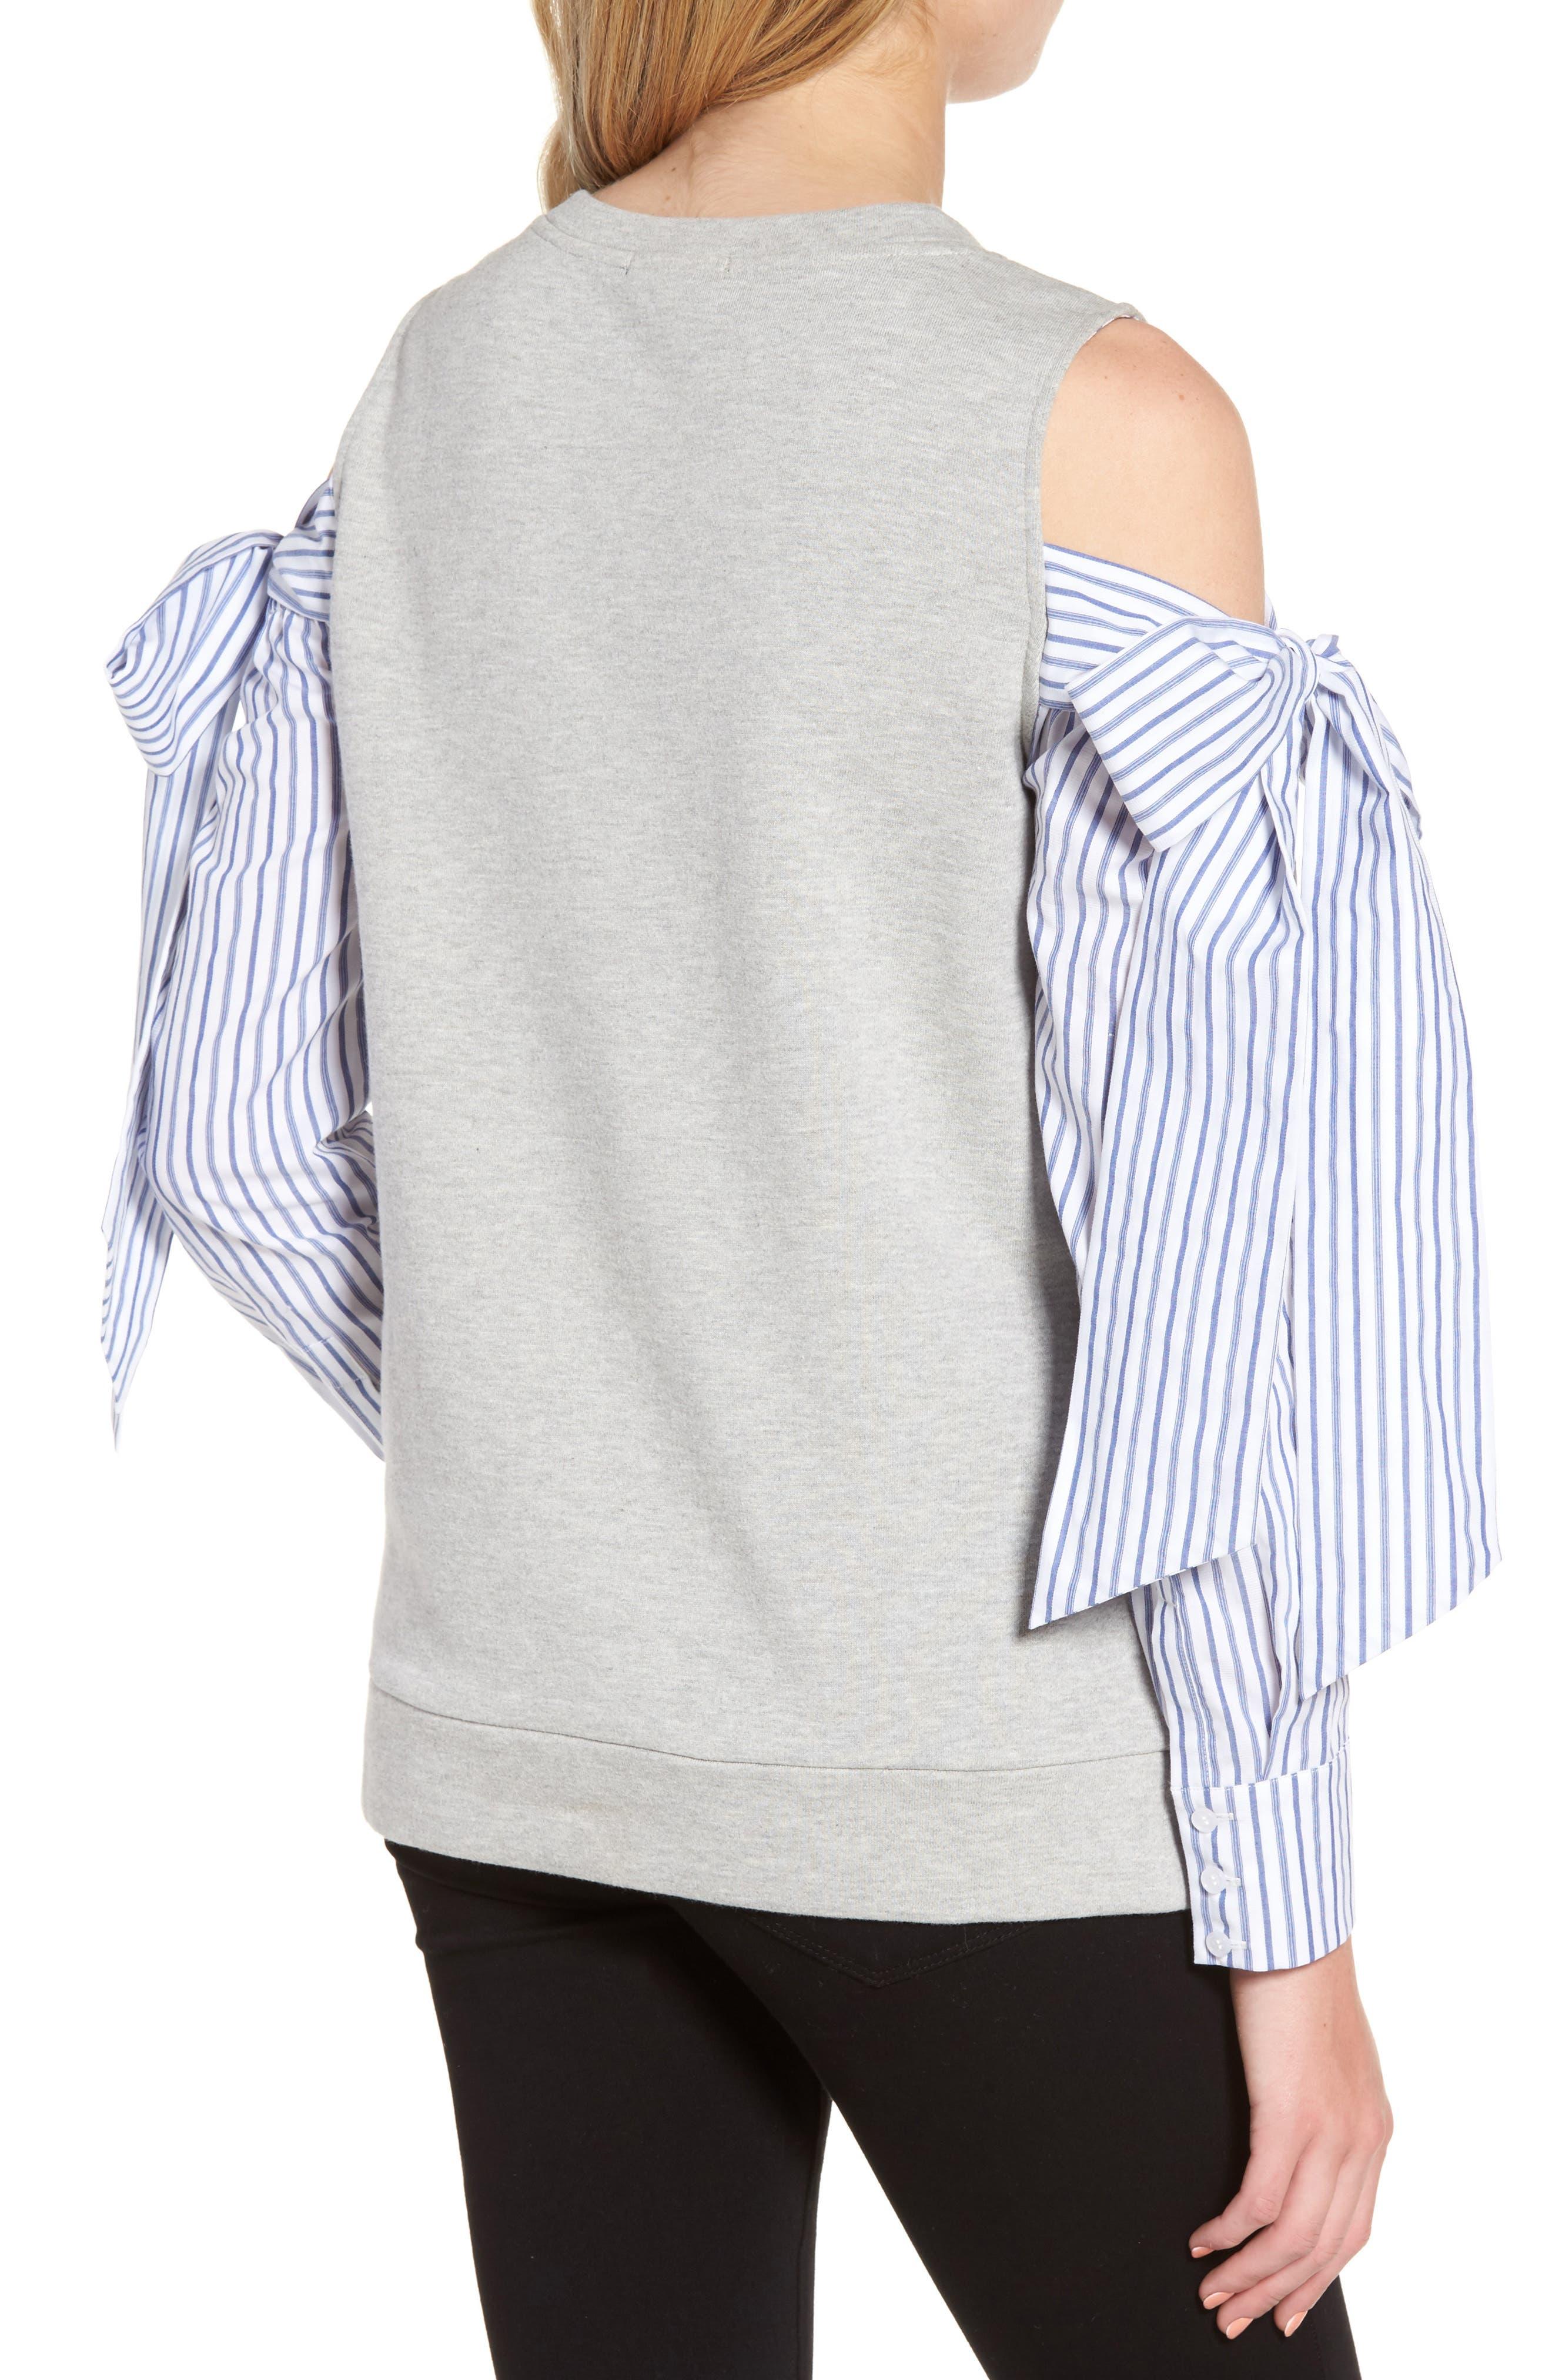 Cold Shoulder Sweatshirt,                             Alternate thumbnail 2, color,                             030